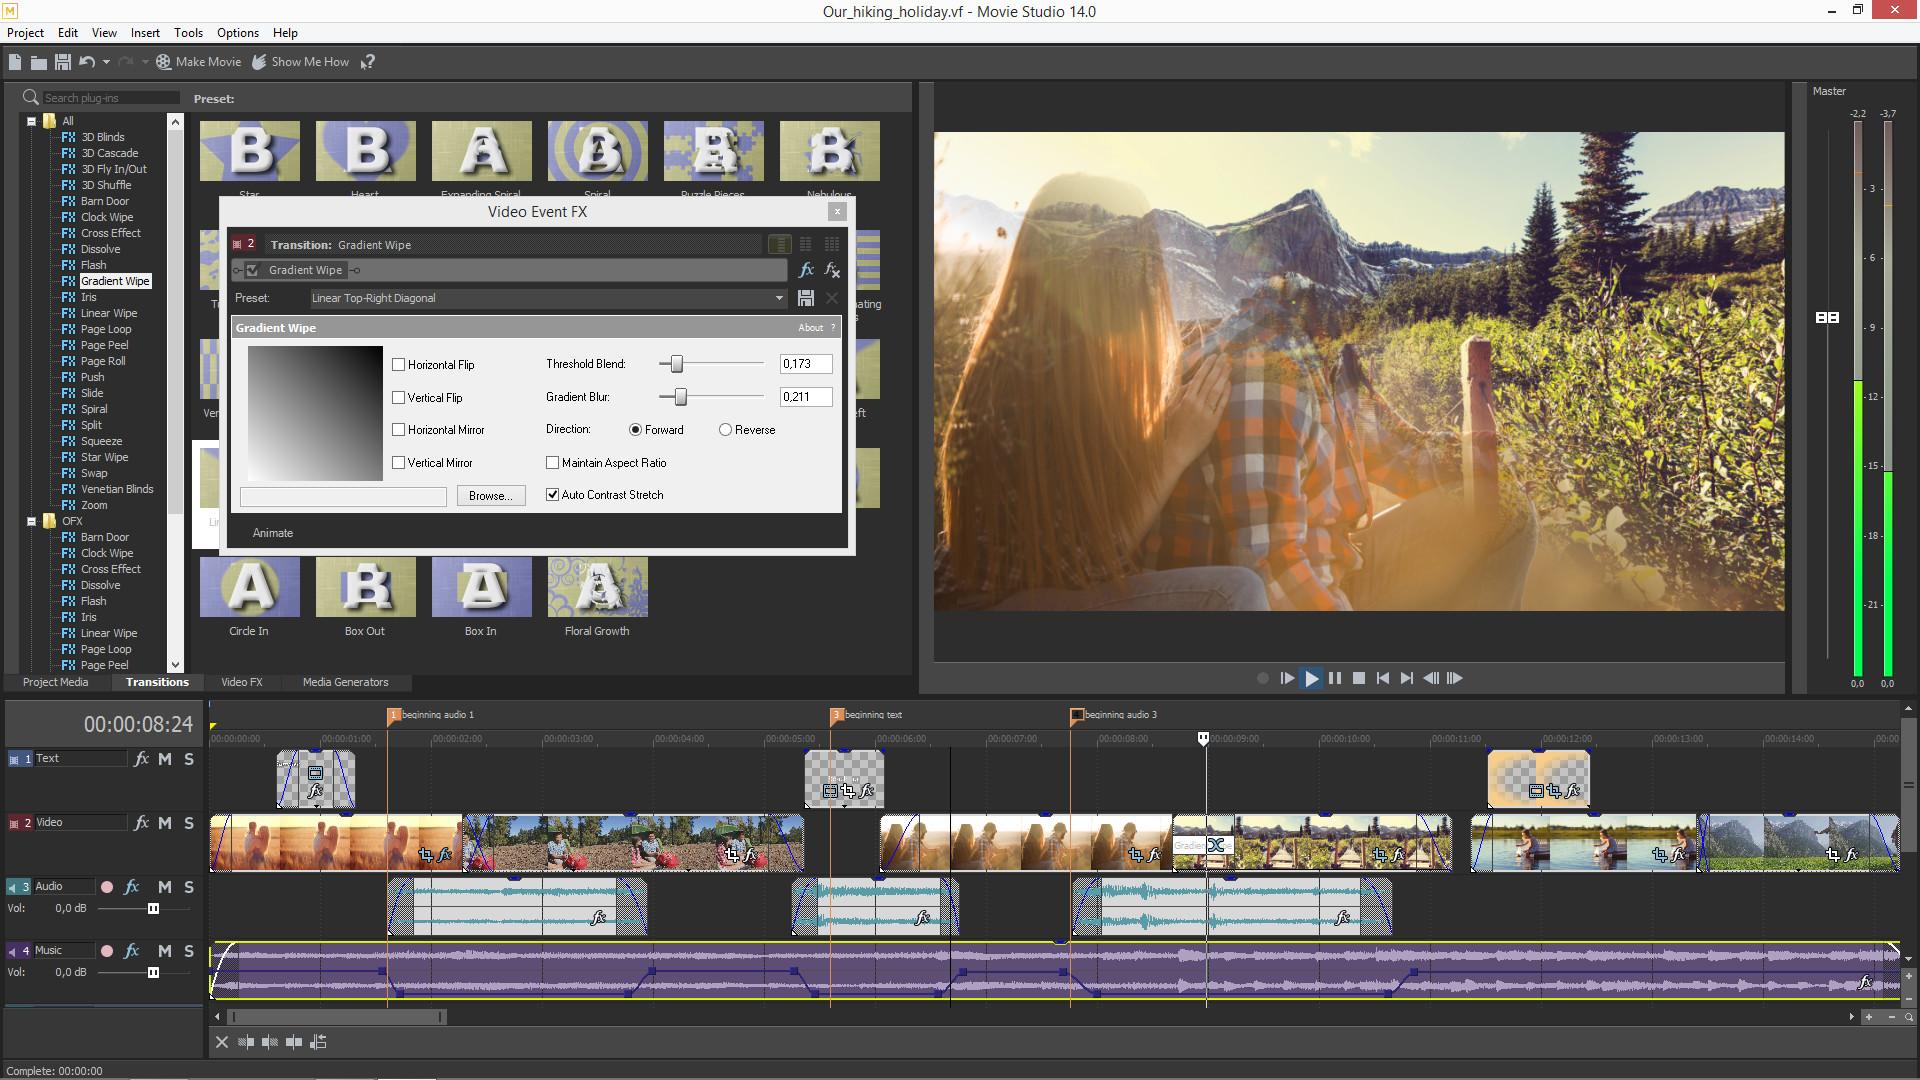 VEGAS Movie Studio 14 Steam Edition screenshot